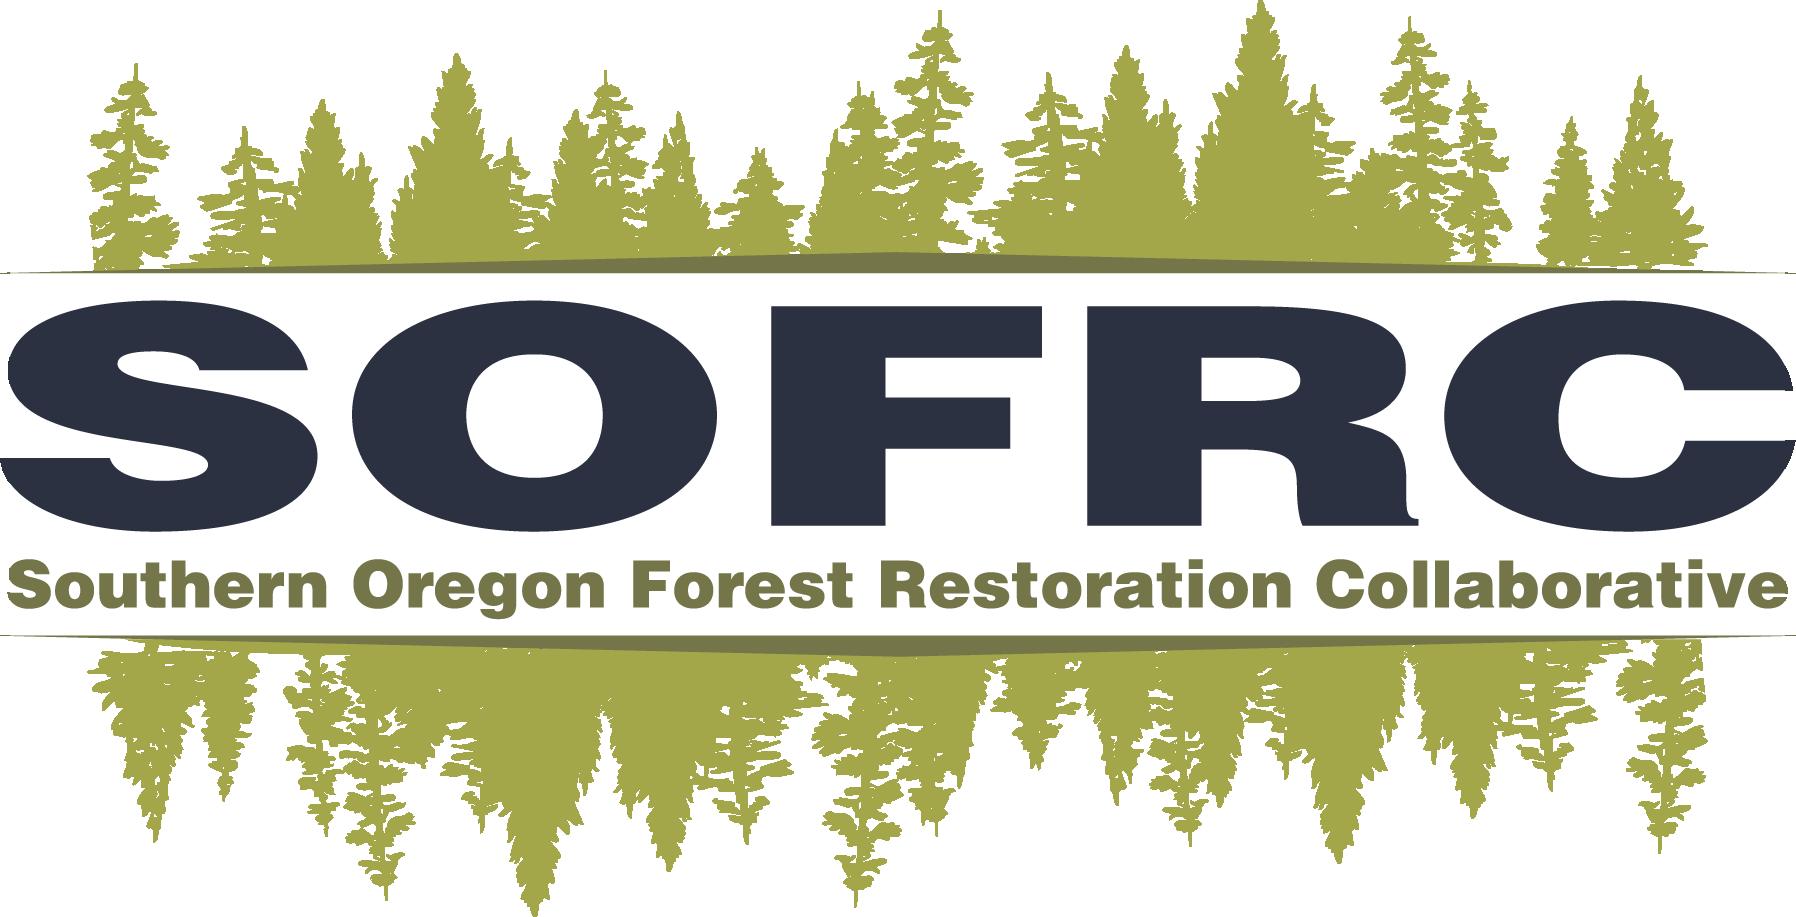 Southern Oregon Forest Restoration Collaborative